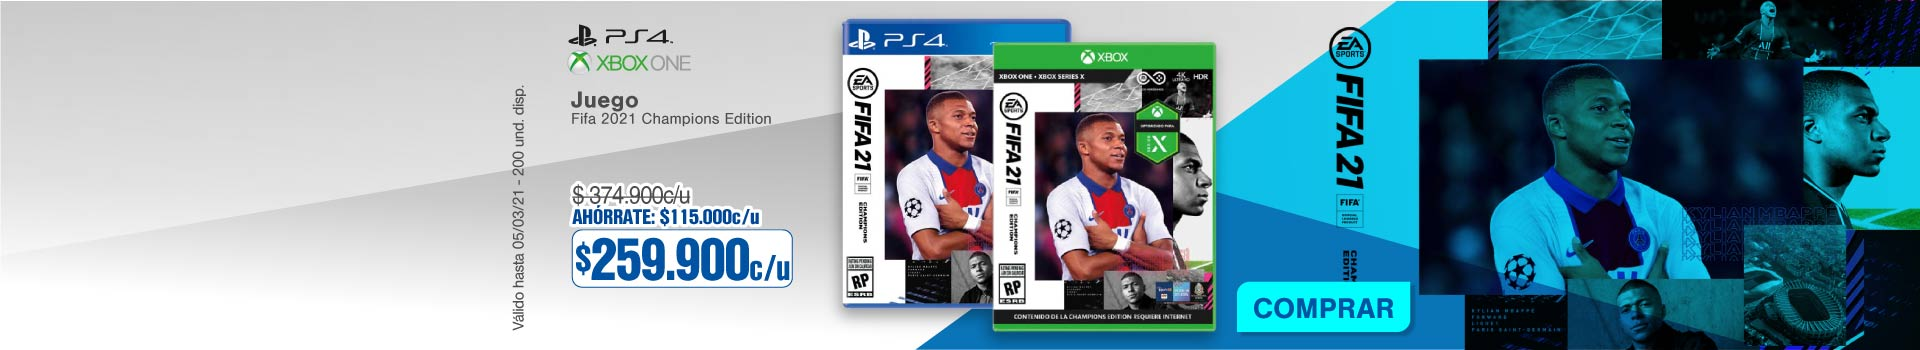 AK-VIDEOJUEGOS-BCAT3-PS4-FIFACHAMPIONS-26FEBRERO2021